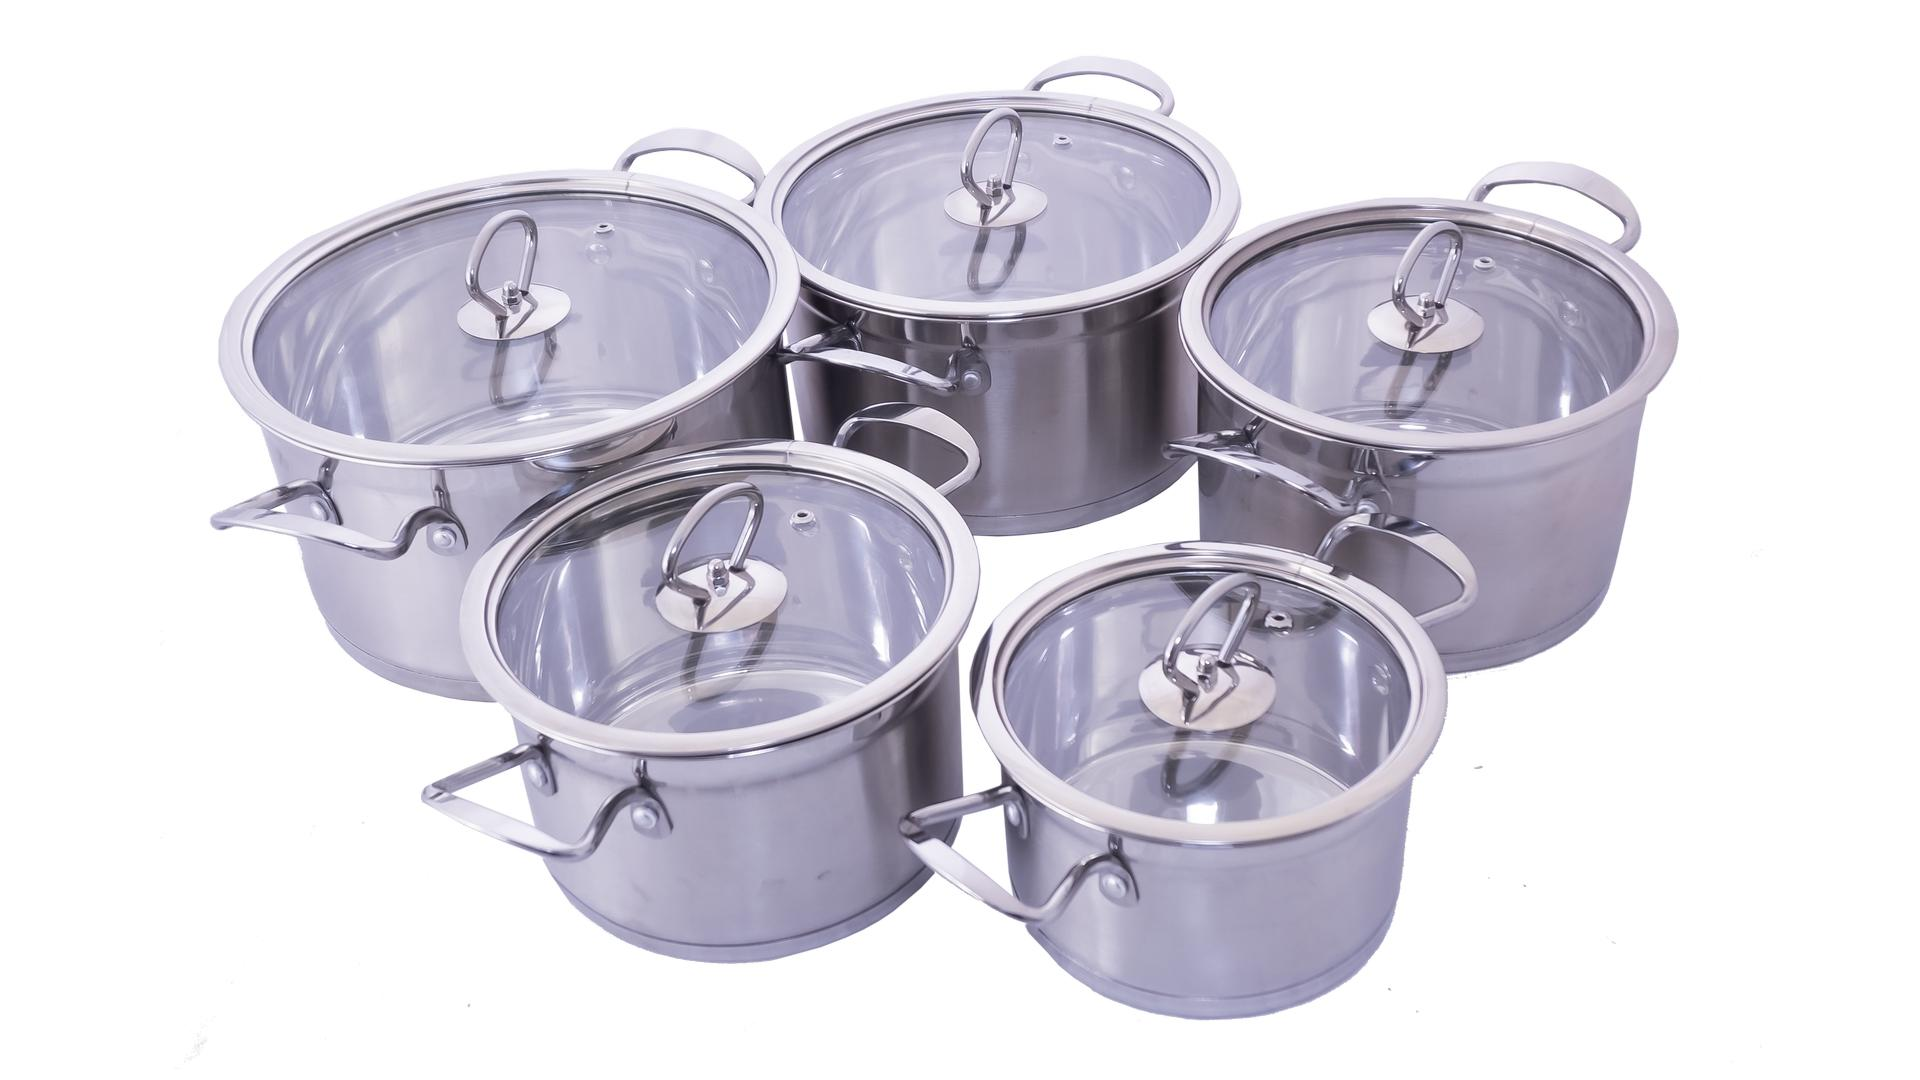 Набор посуды нержавеющий Empire - 2,5 x 2,6 x 3,3 x 4,2 x 5,5 л (5 шт.) 3